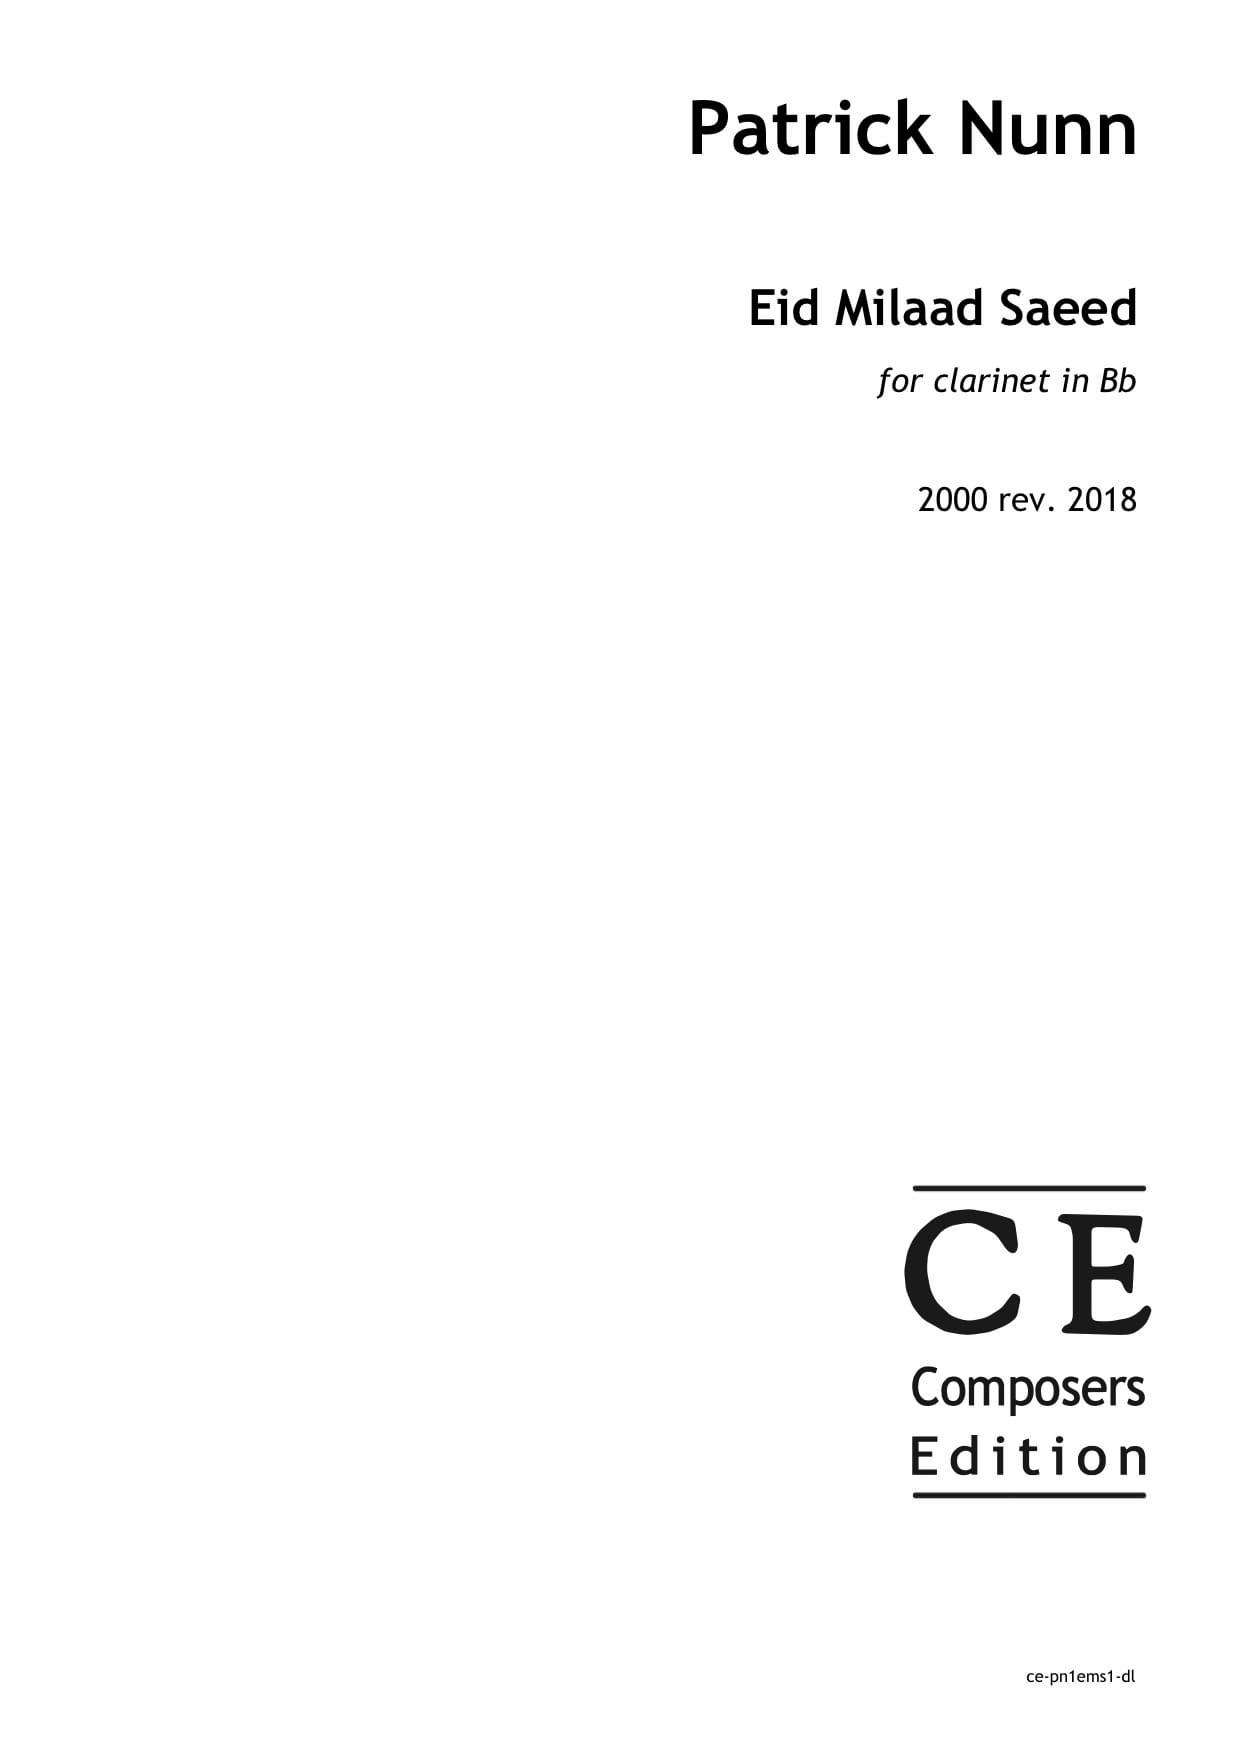 Patrick Nunn: Eid Milaad Saeed for clarinet in Bb